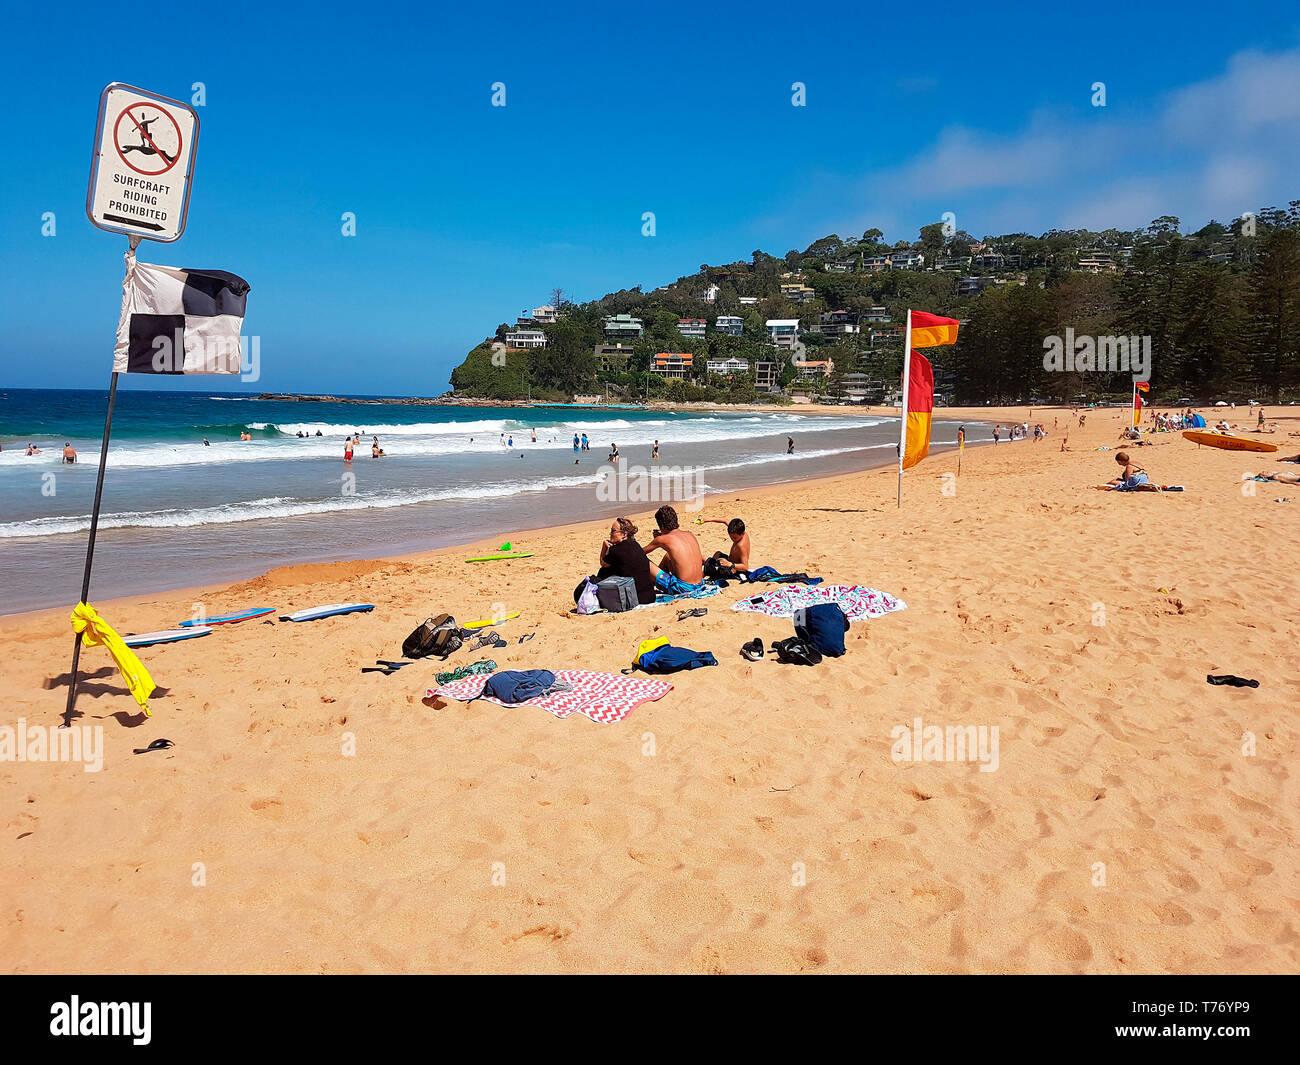 Impressionen: Palm beach, Sydney, Australia. - Stock Image